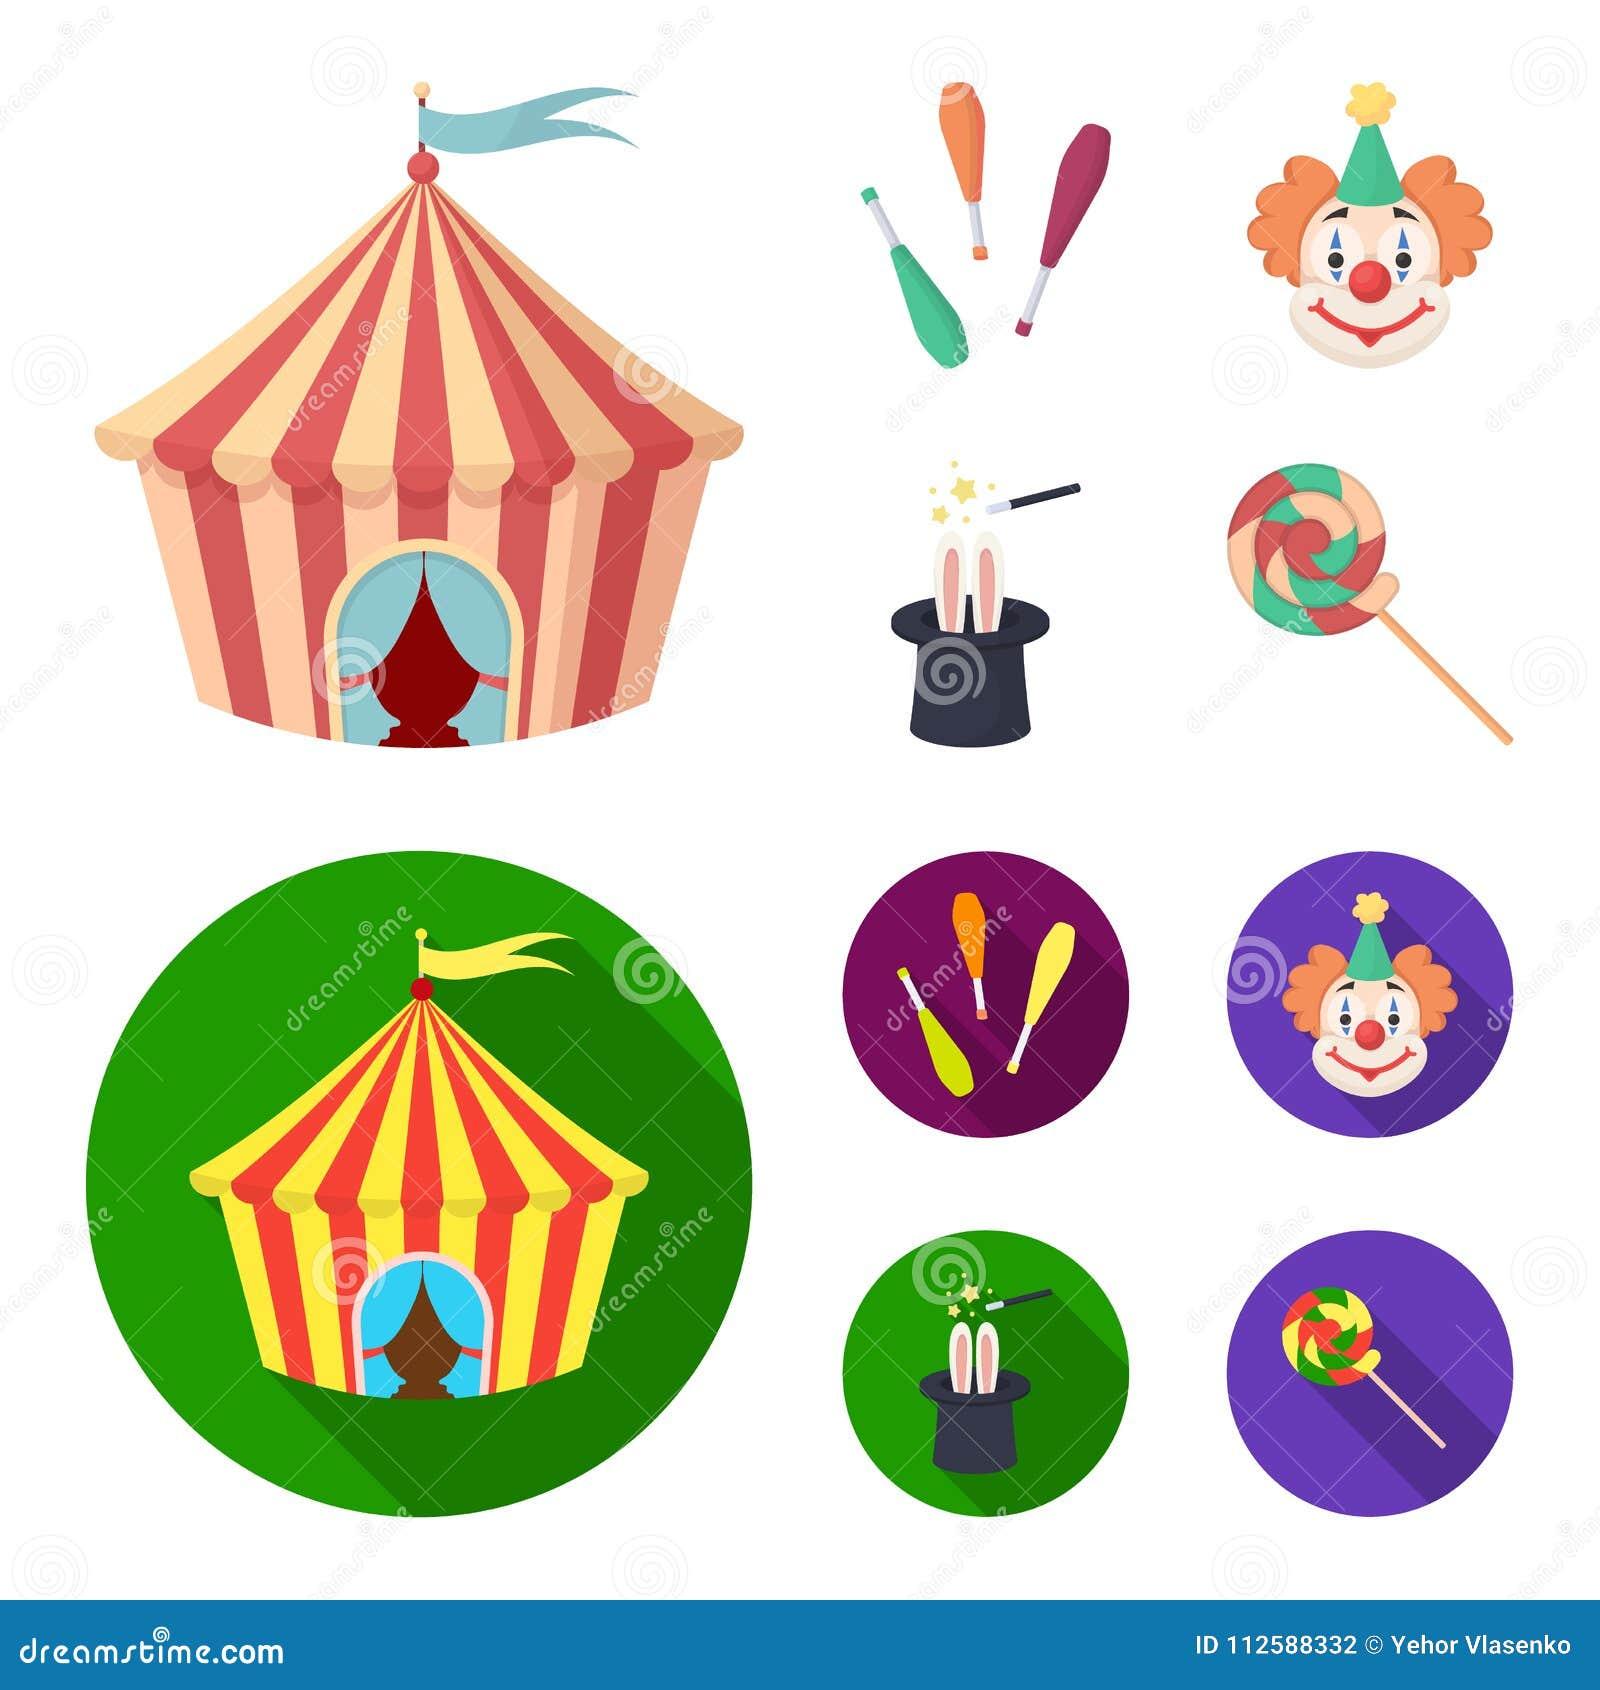 Tenda Do Circus Macis Do Juggler Palhaco Chapeu Do Magico